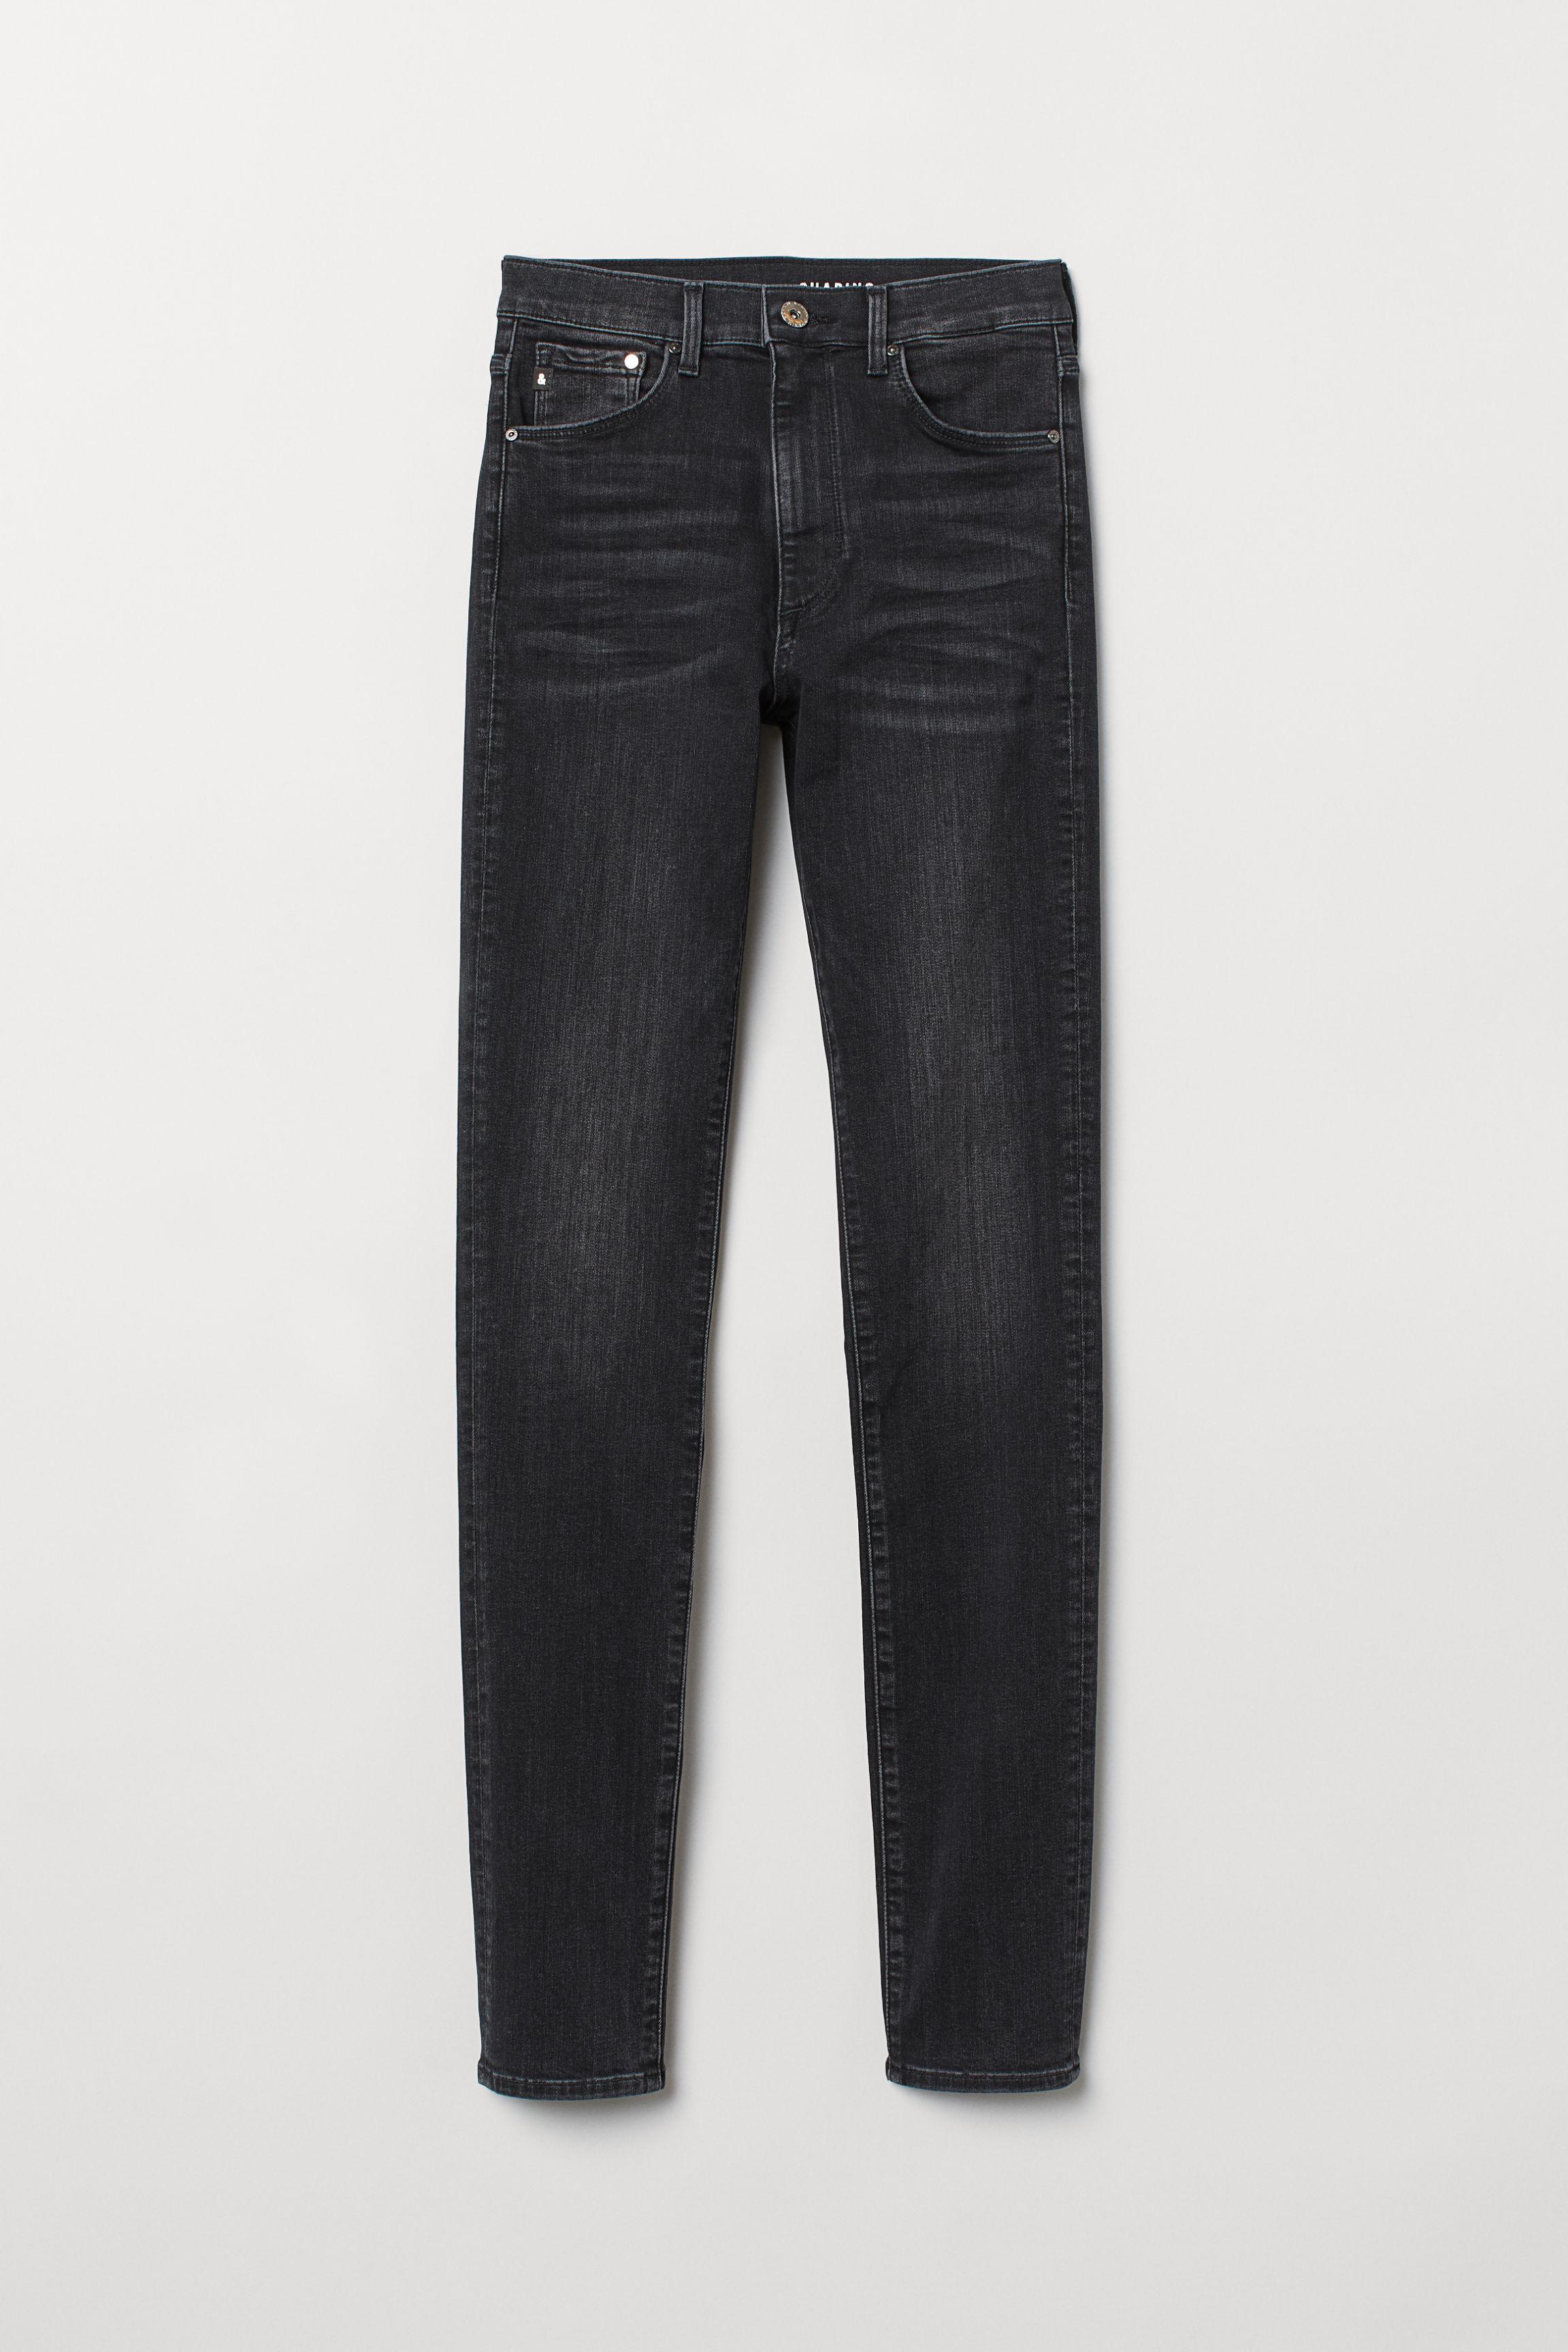 18670a897ce Black Jeans That Look Like Dress Pants – DACC